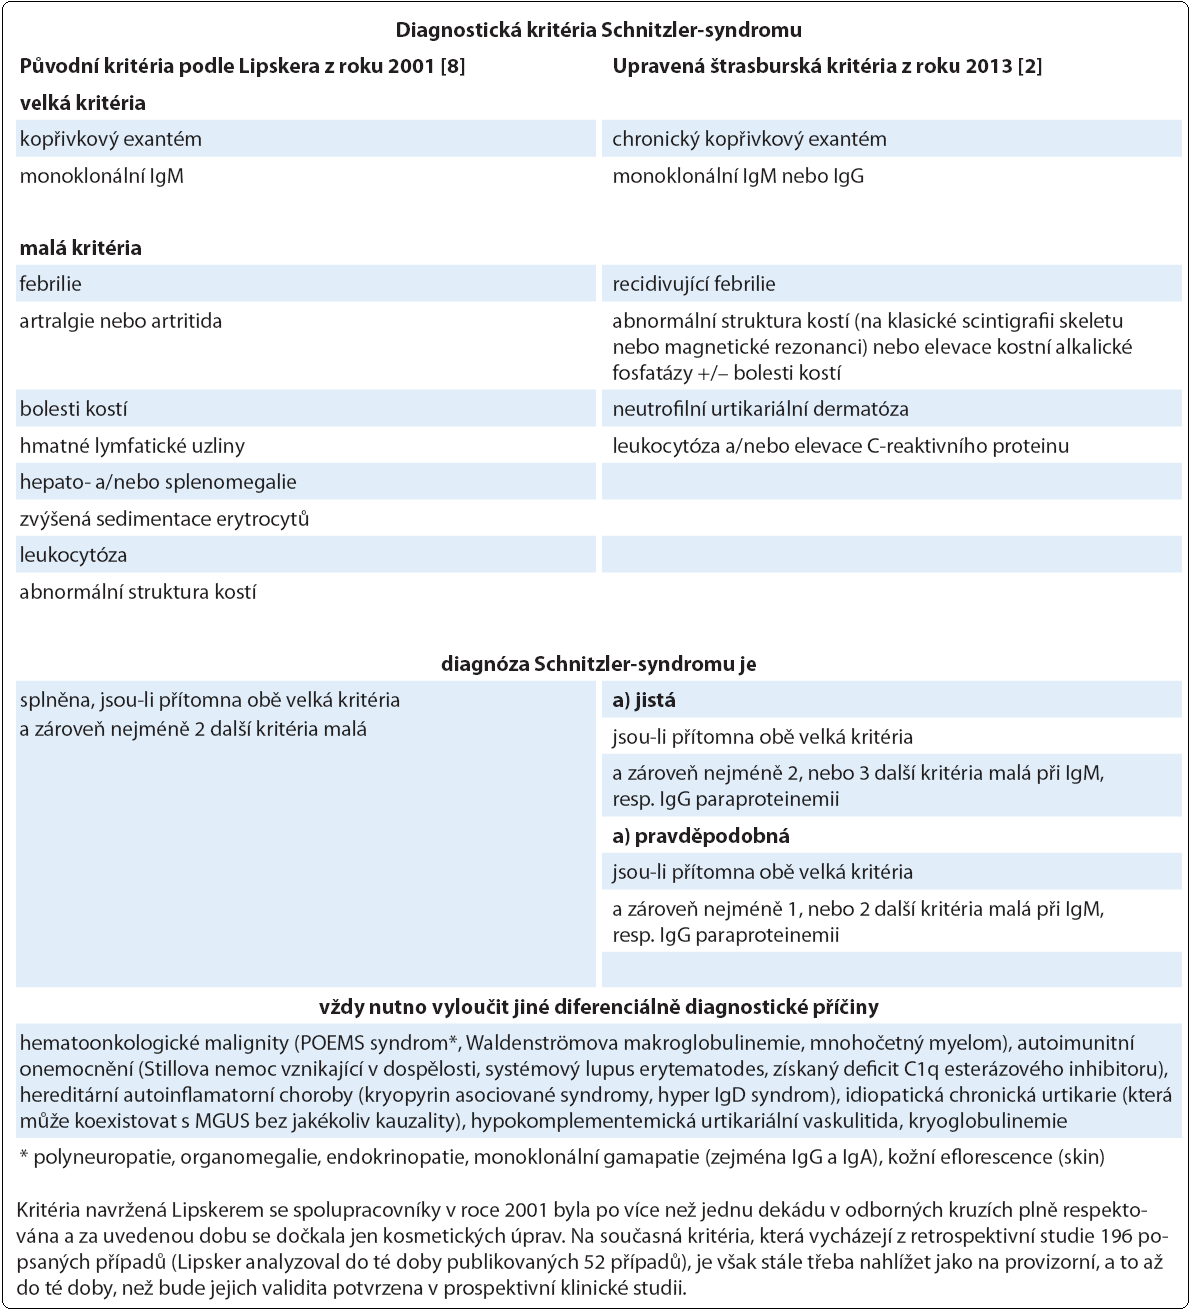 Souhrnný pohled na diagnostická kritéria Schnitzler-syndromu.